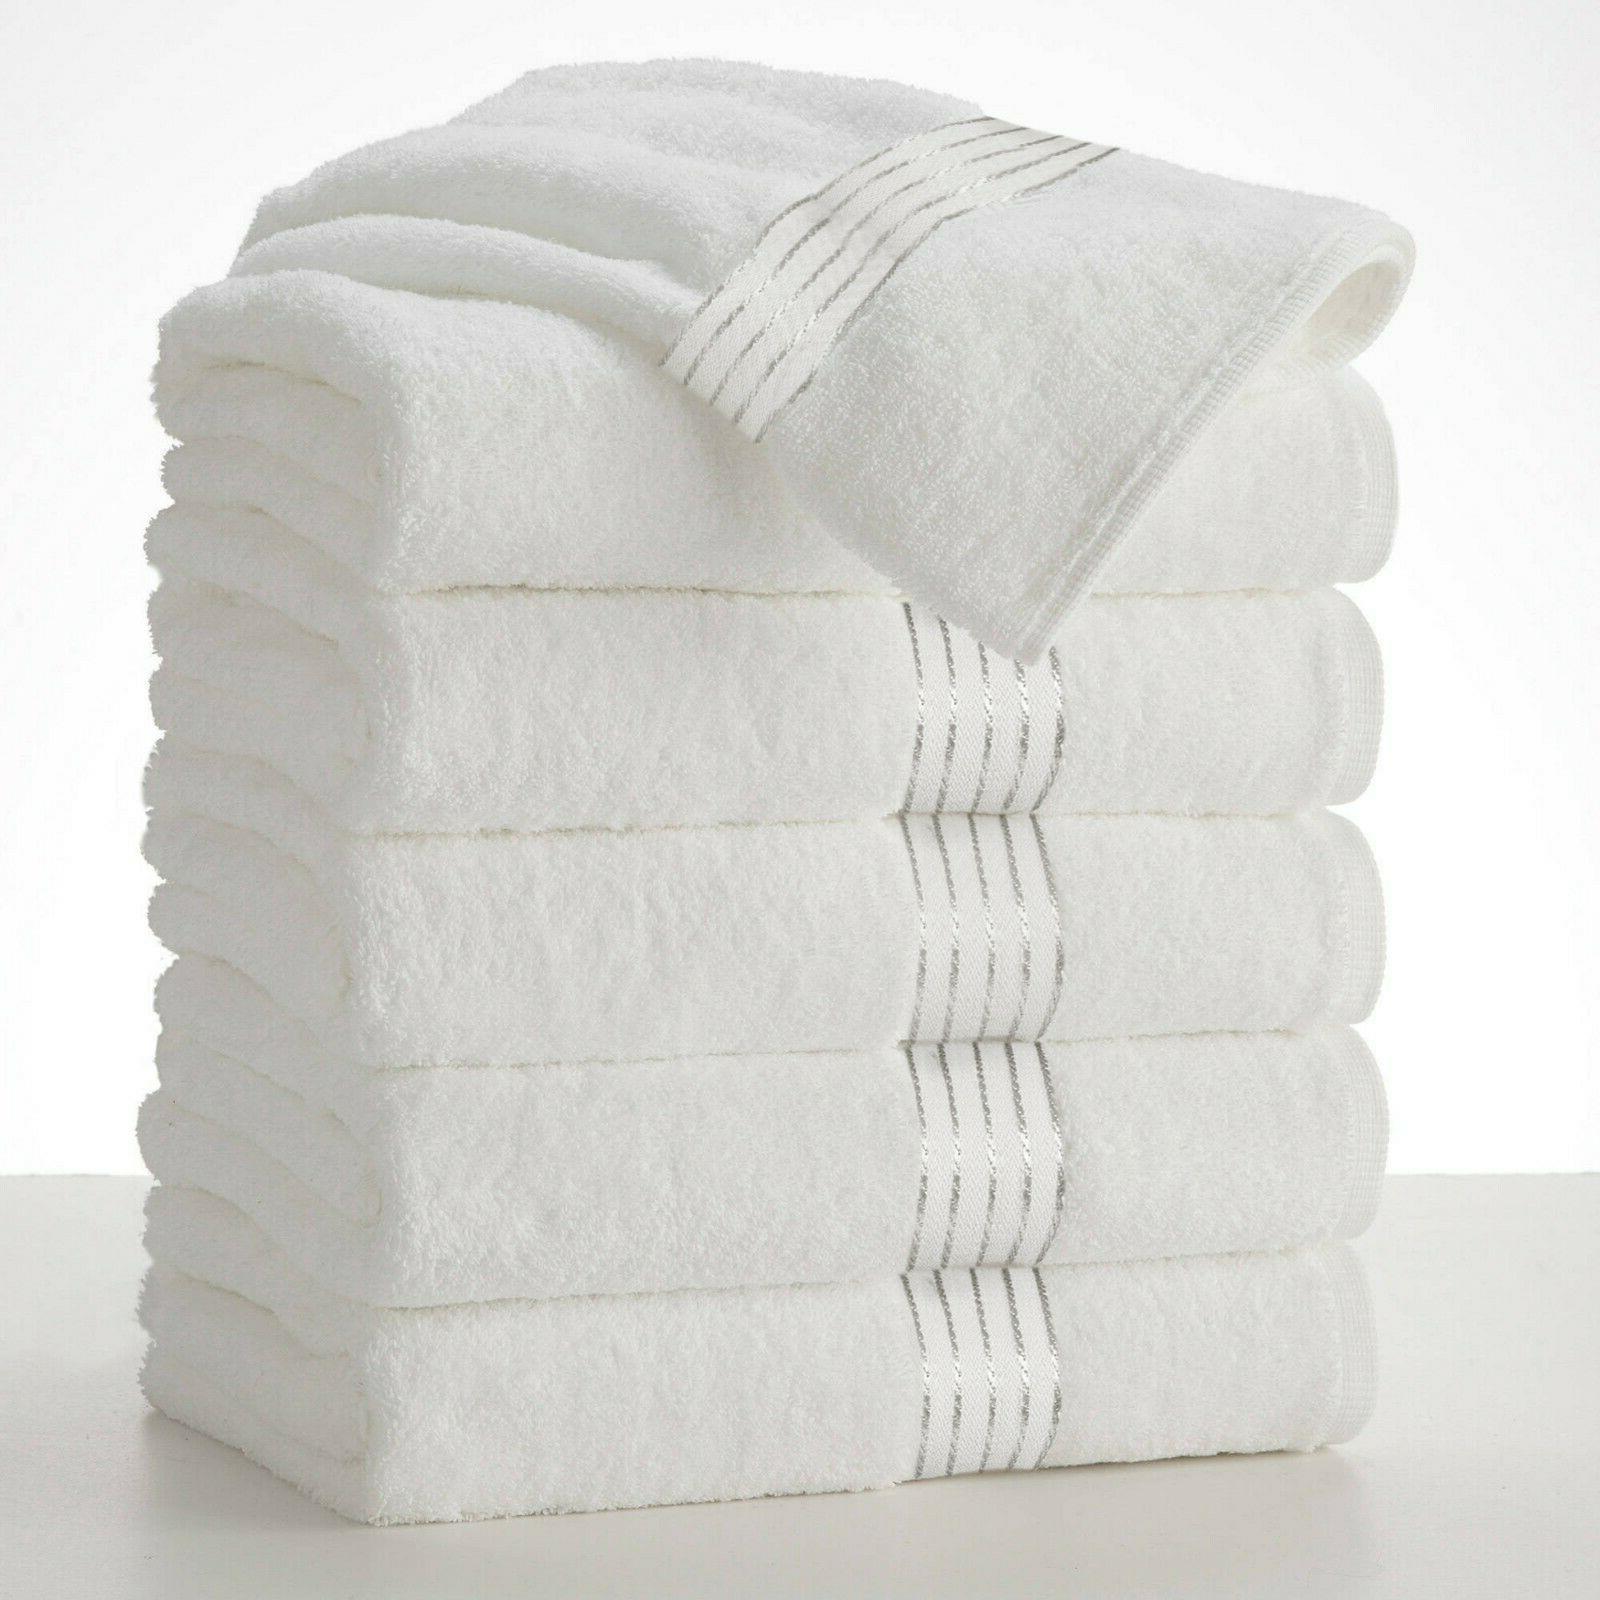 "Large Sets Cotton 27""x55"" GSM Absorbent"